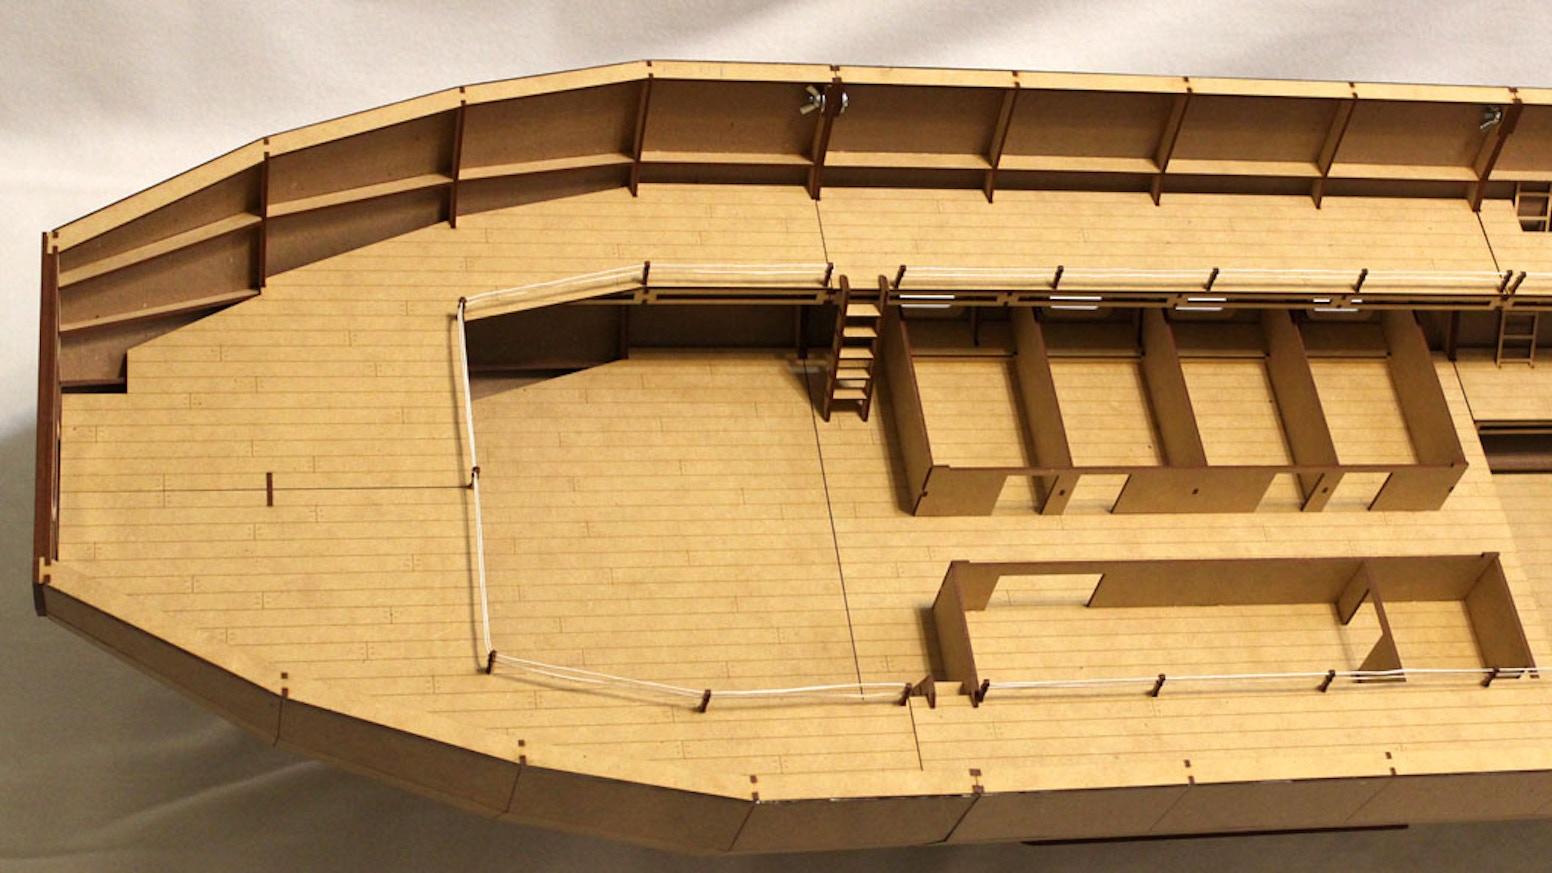 Massive Zeppelin Model for 28mm VSF/Pulp Gaming by Rusti